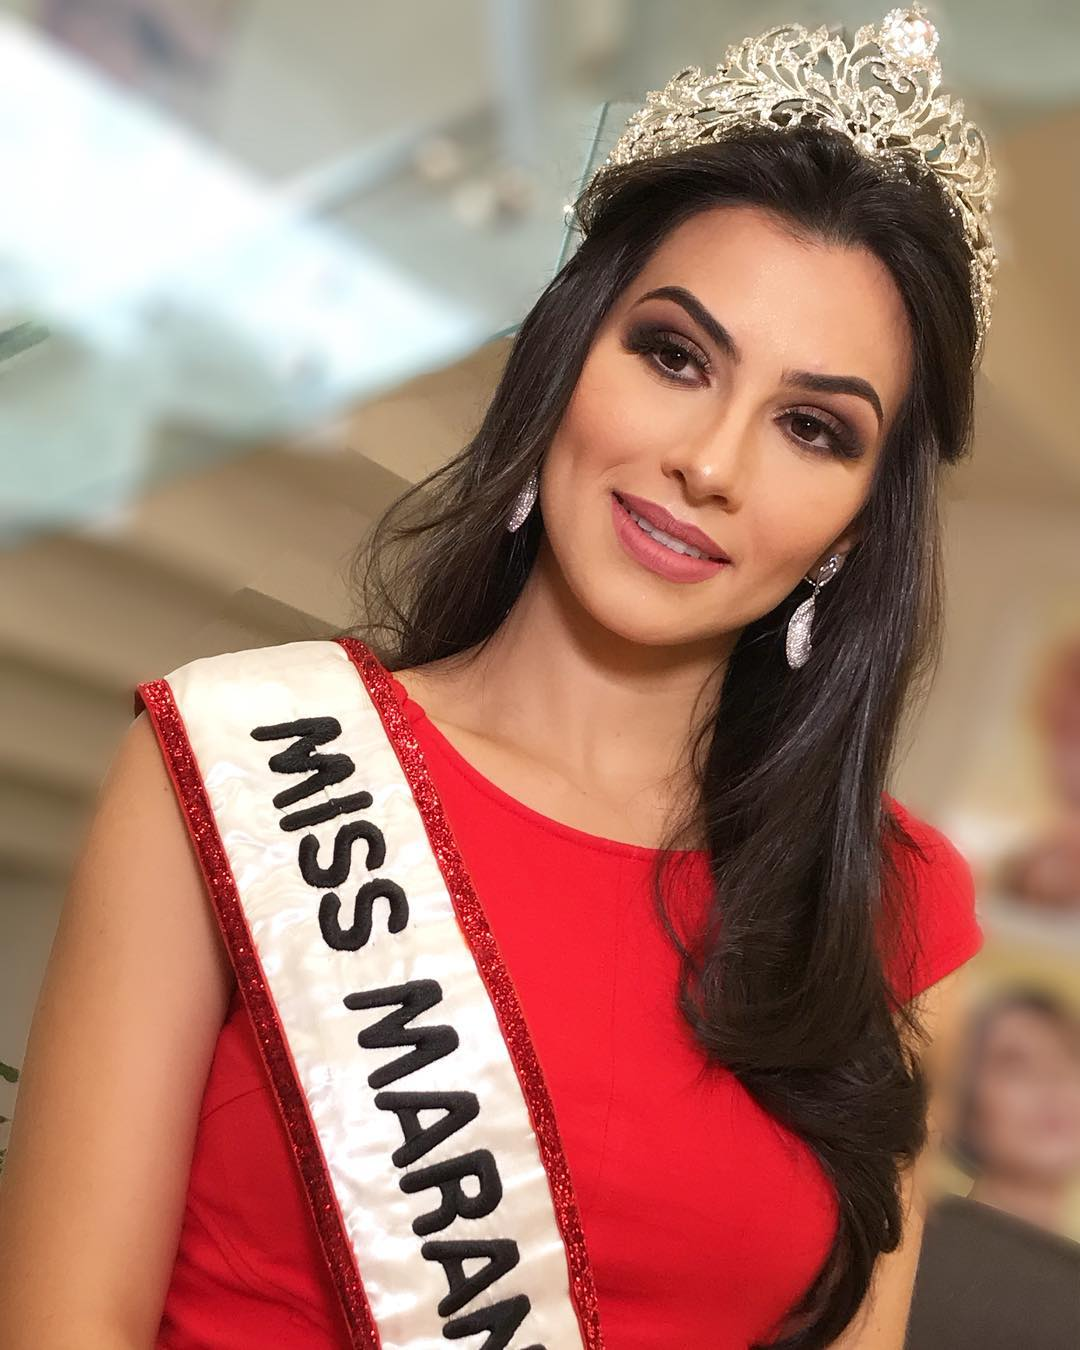 lorena bessani, miss maranhao universo 2018. - Página 2 30829910